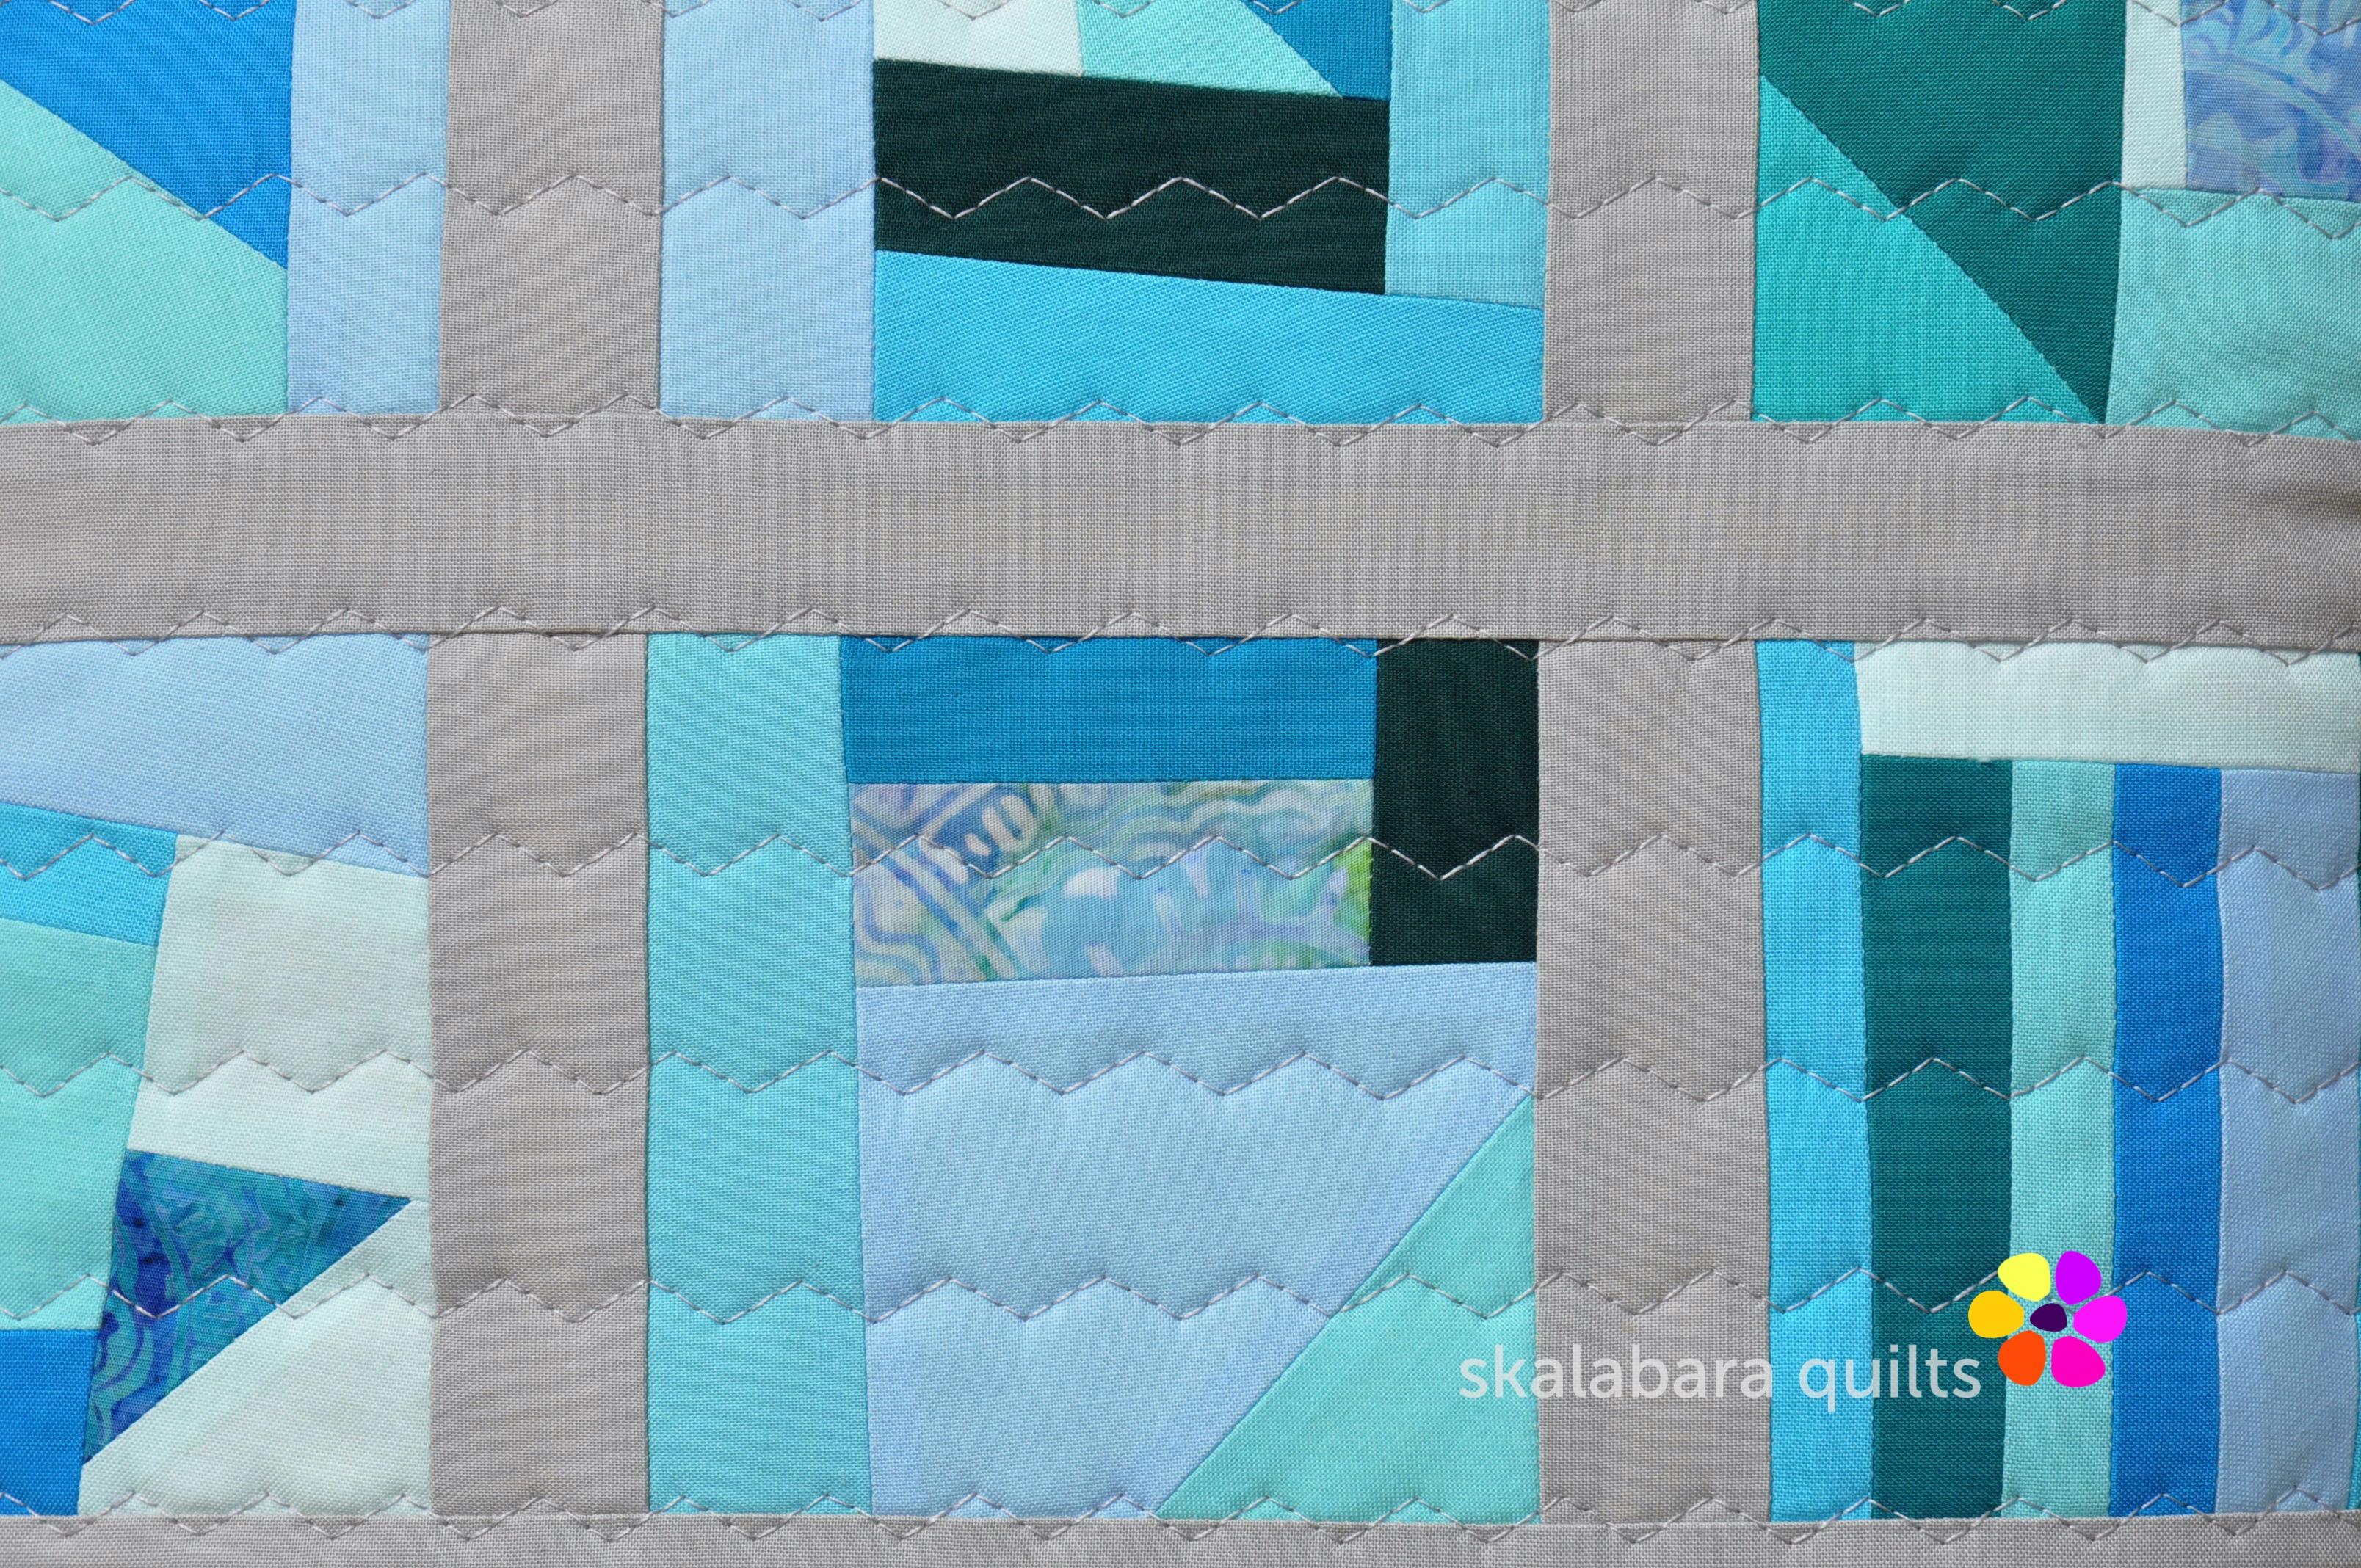 april turquoise cushion detail - skalabara quilts